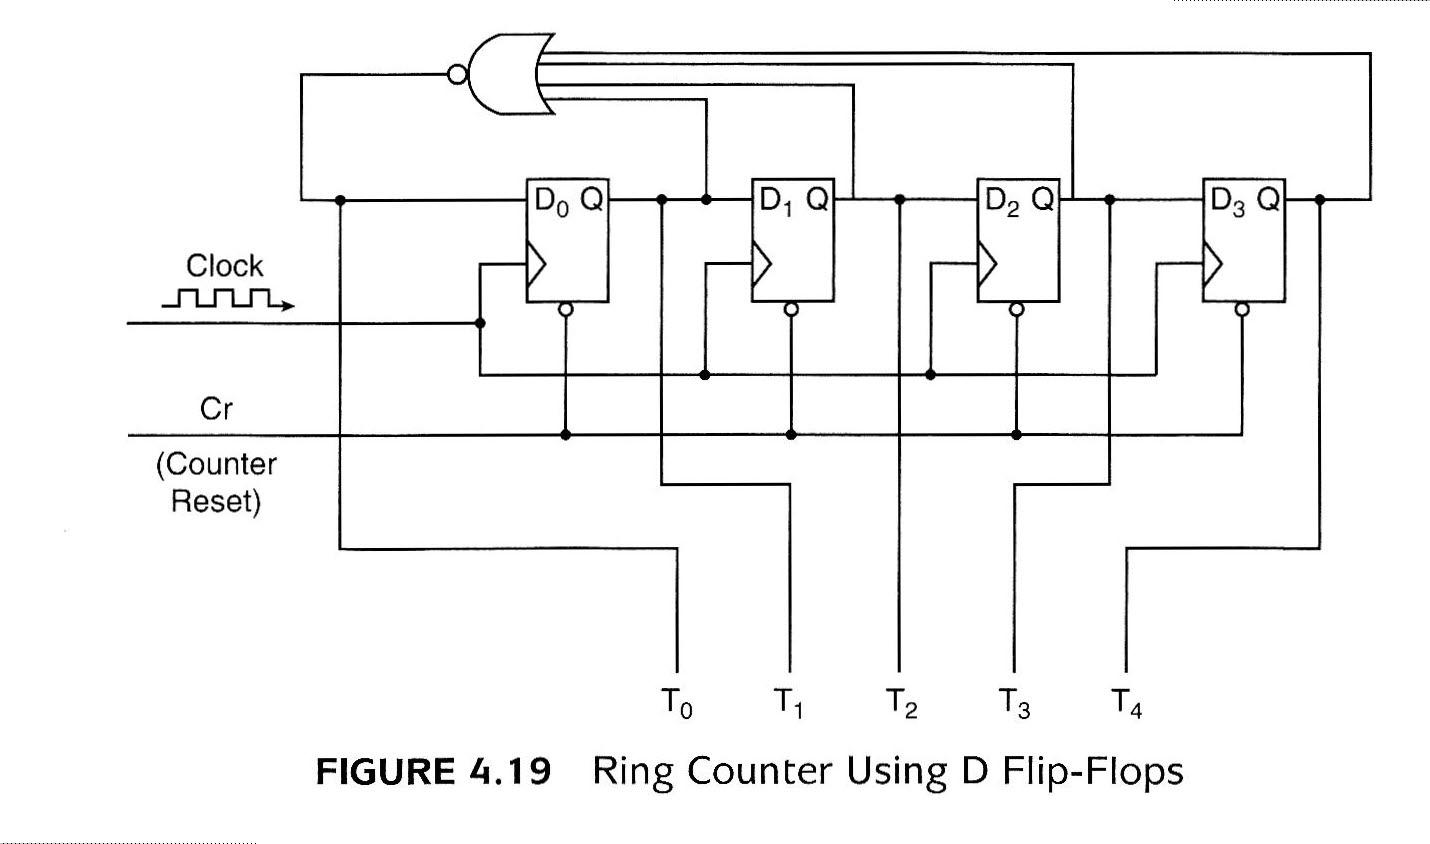 Figure 4.19 Ring Counter Using D Flip-Flops